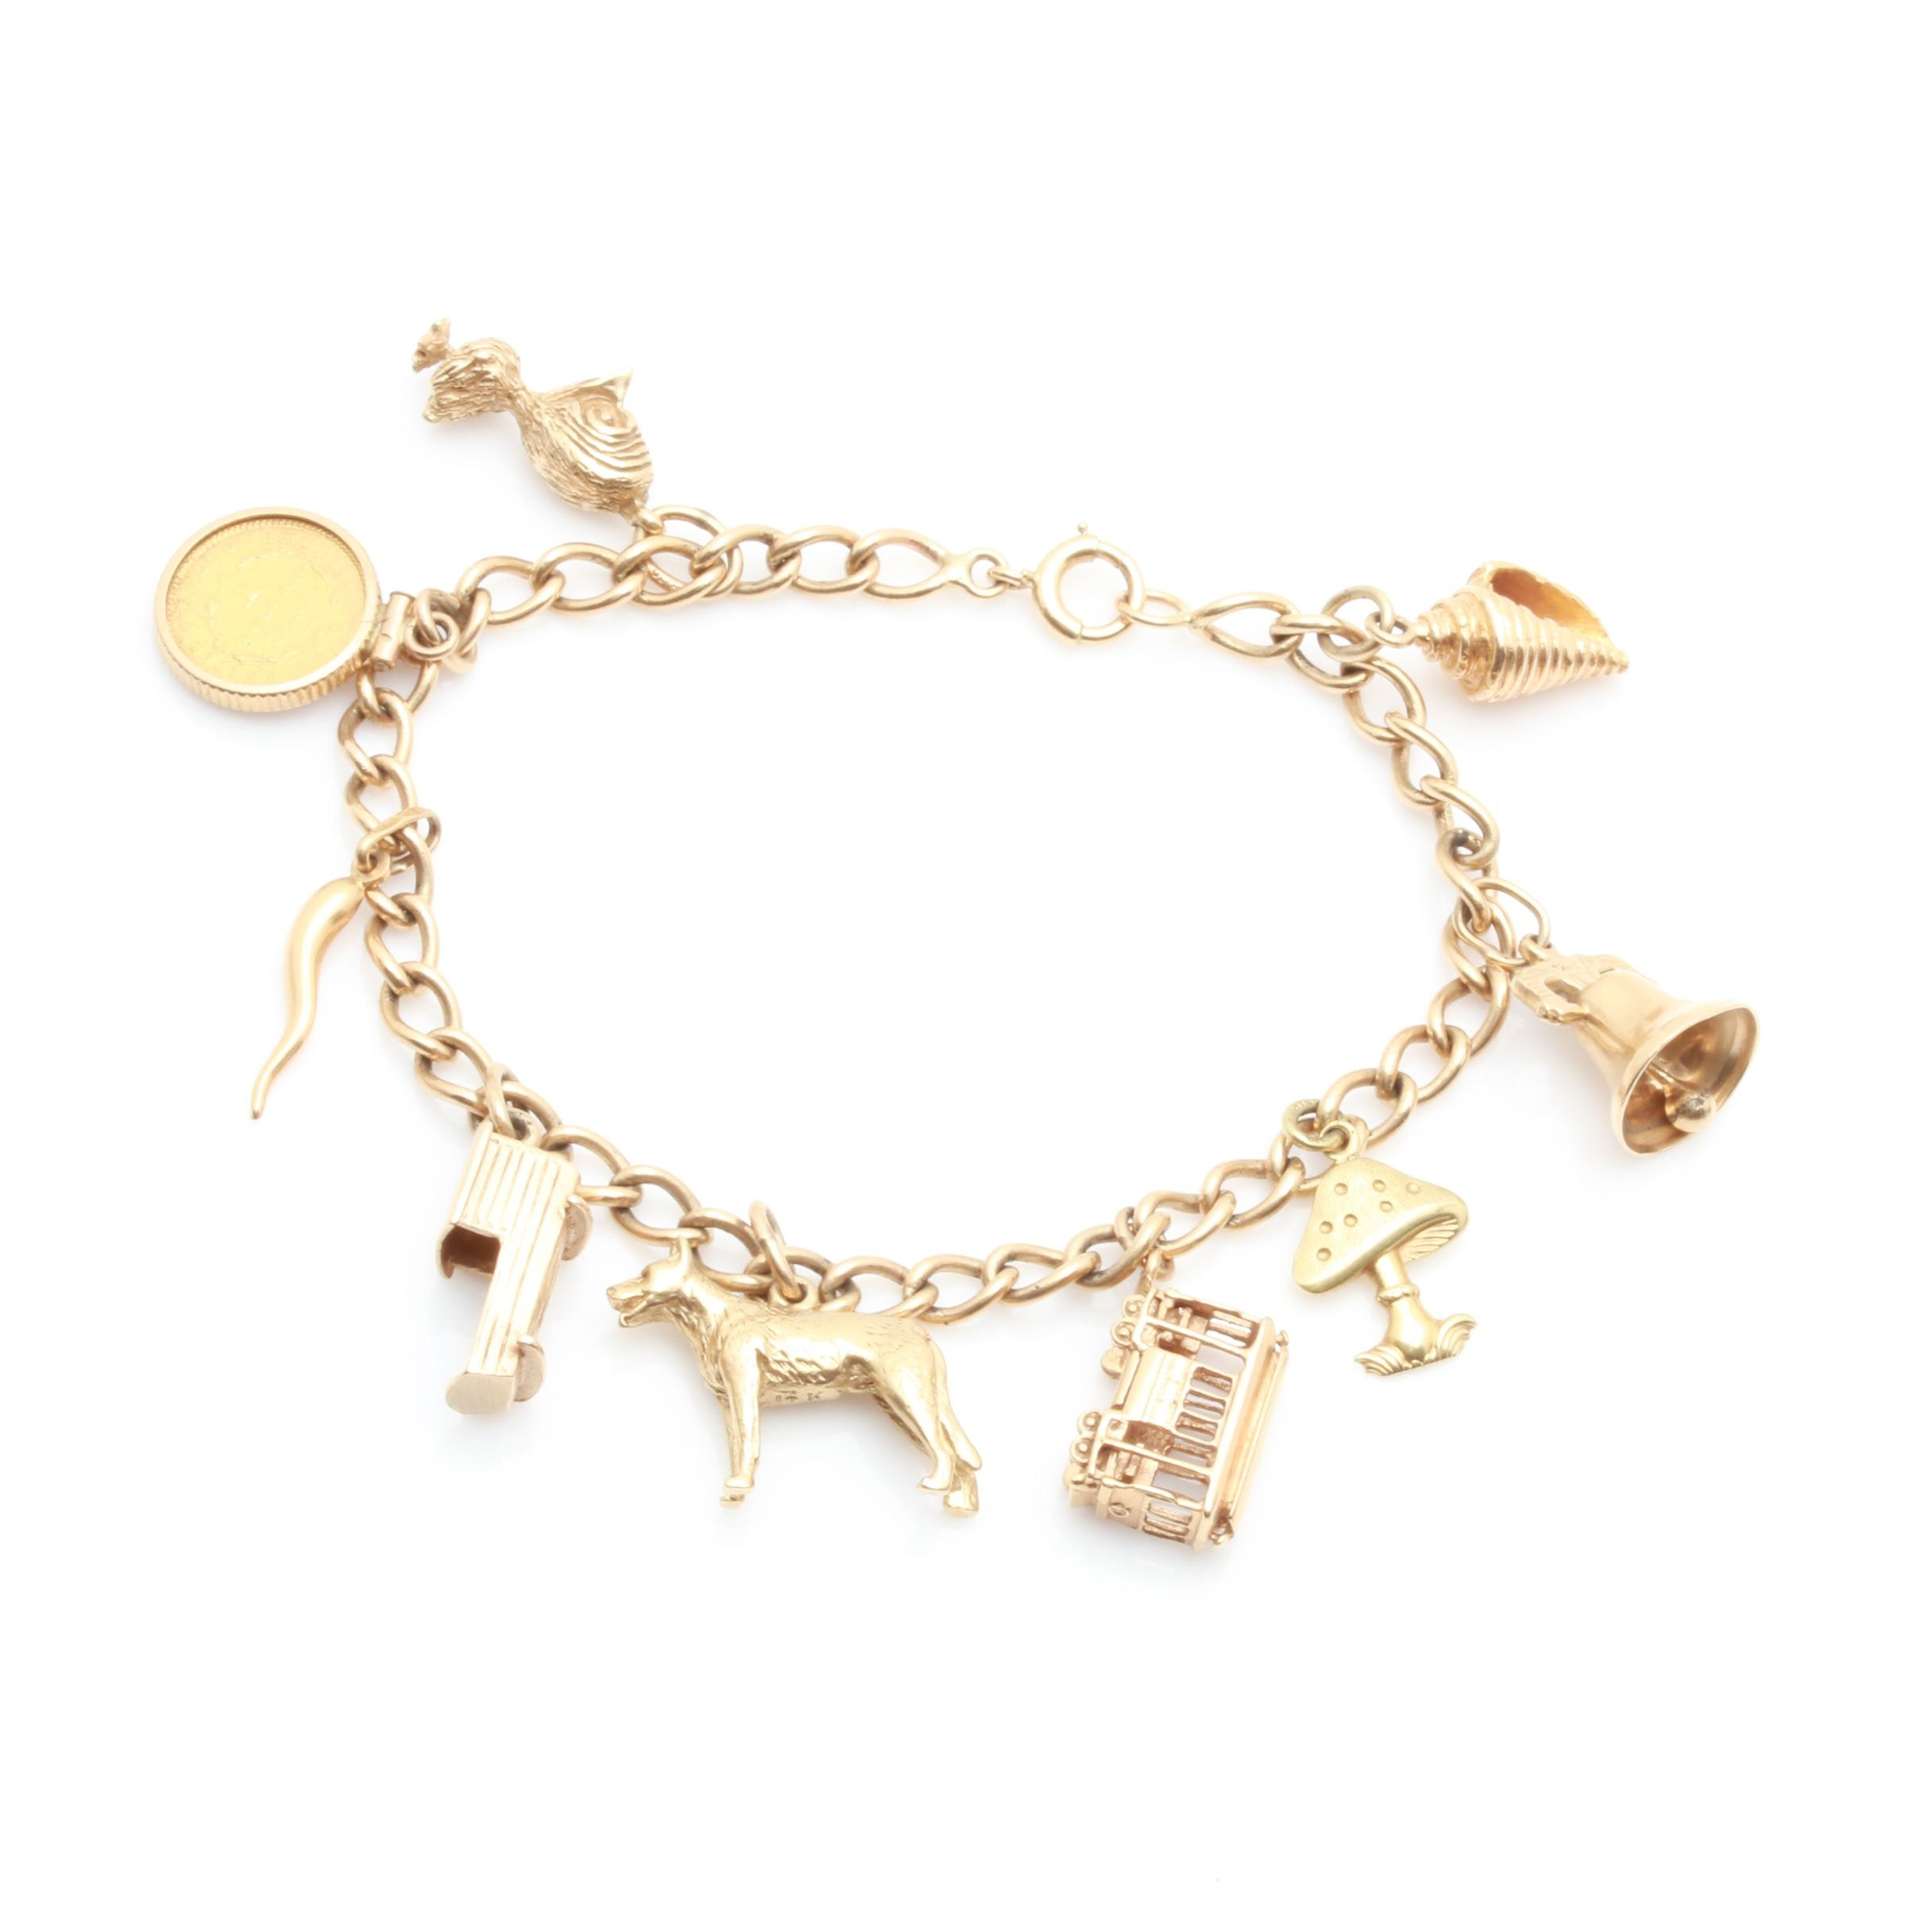 14K and 18K Yellow Gold Charm Bracelet